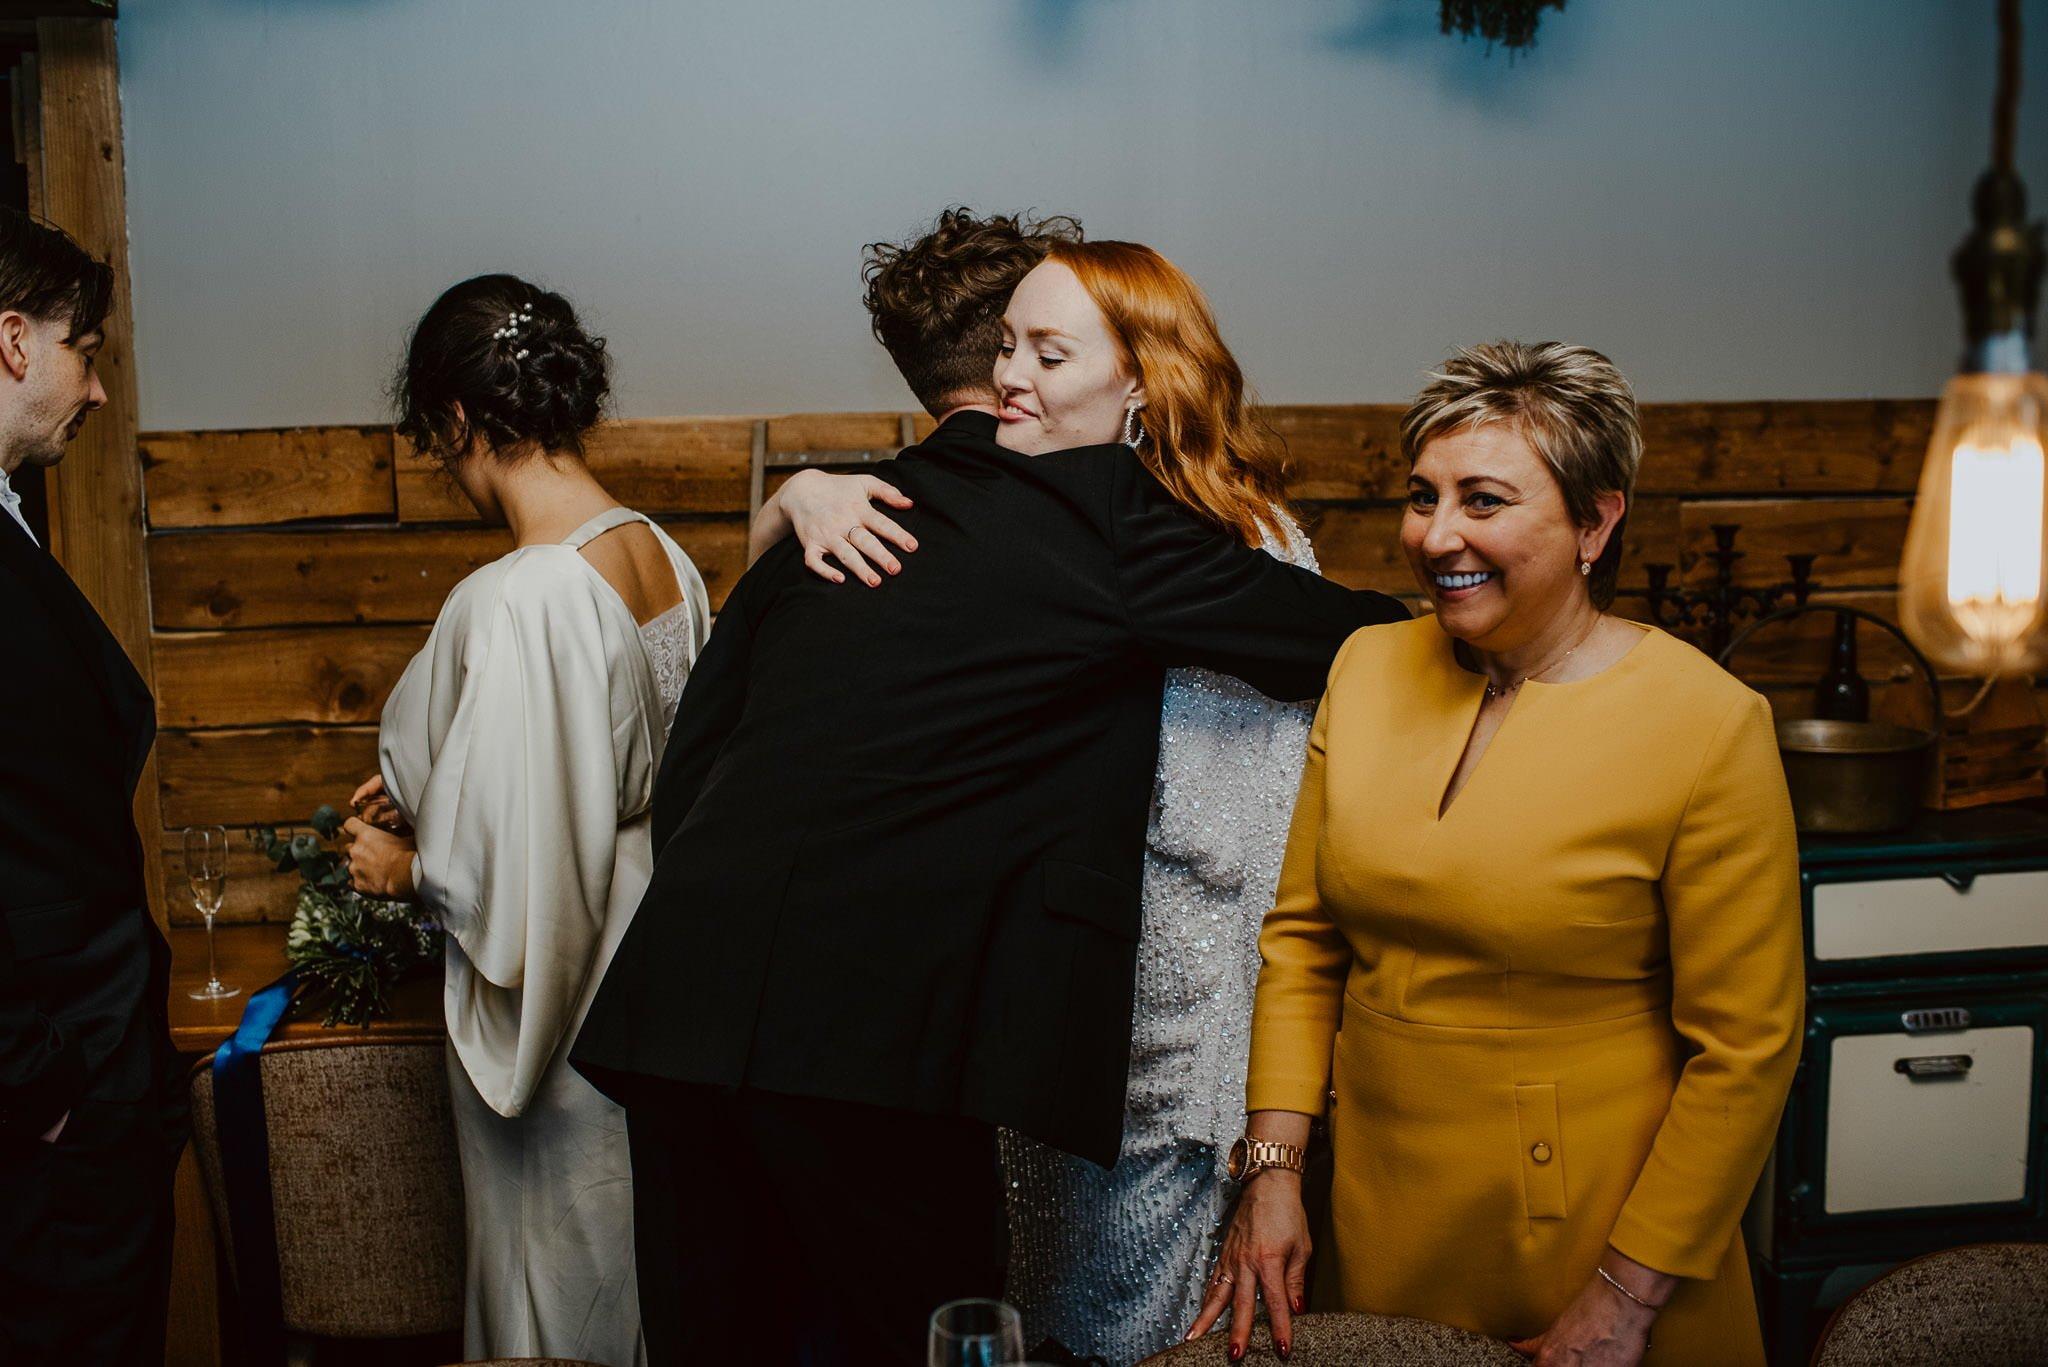 A Dreamy Pre-Raphaelite Wedding at the Bothy in Glasgow 19